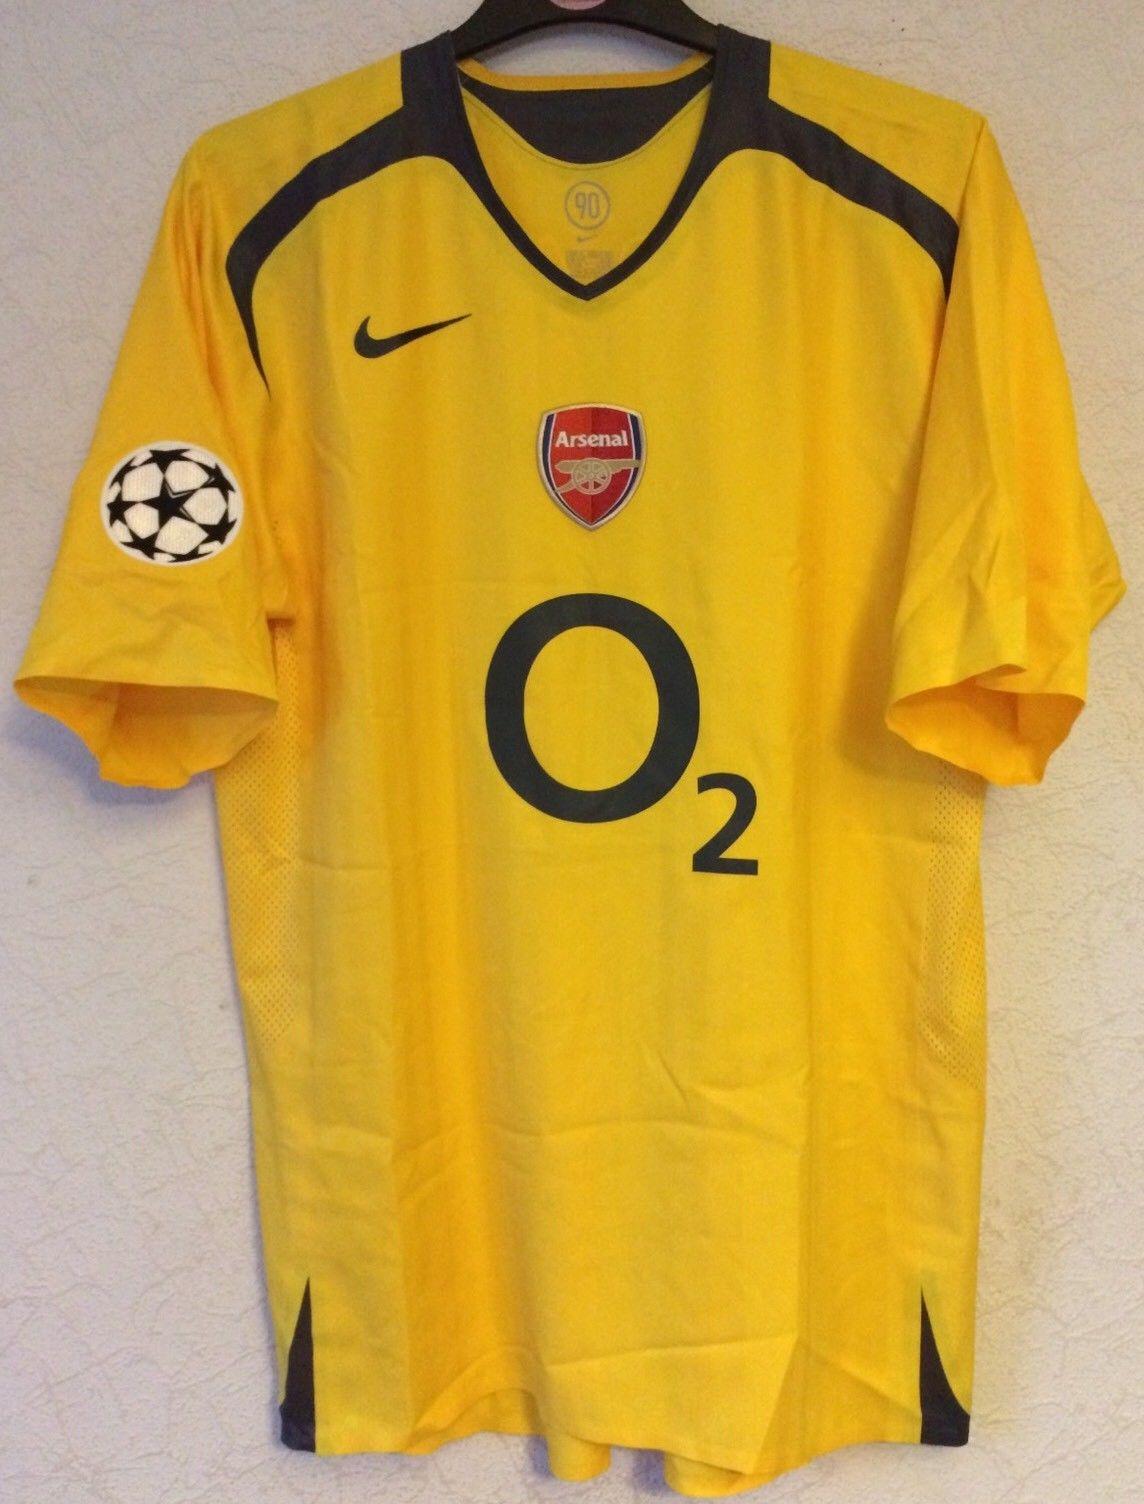 reputable site 17b31 9addc Arsenal Player Issue Emmanuel Adebayor 25 Football Shirt 2005/06 Adults XL  Nike